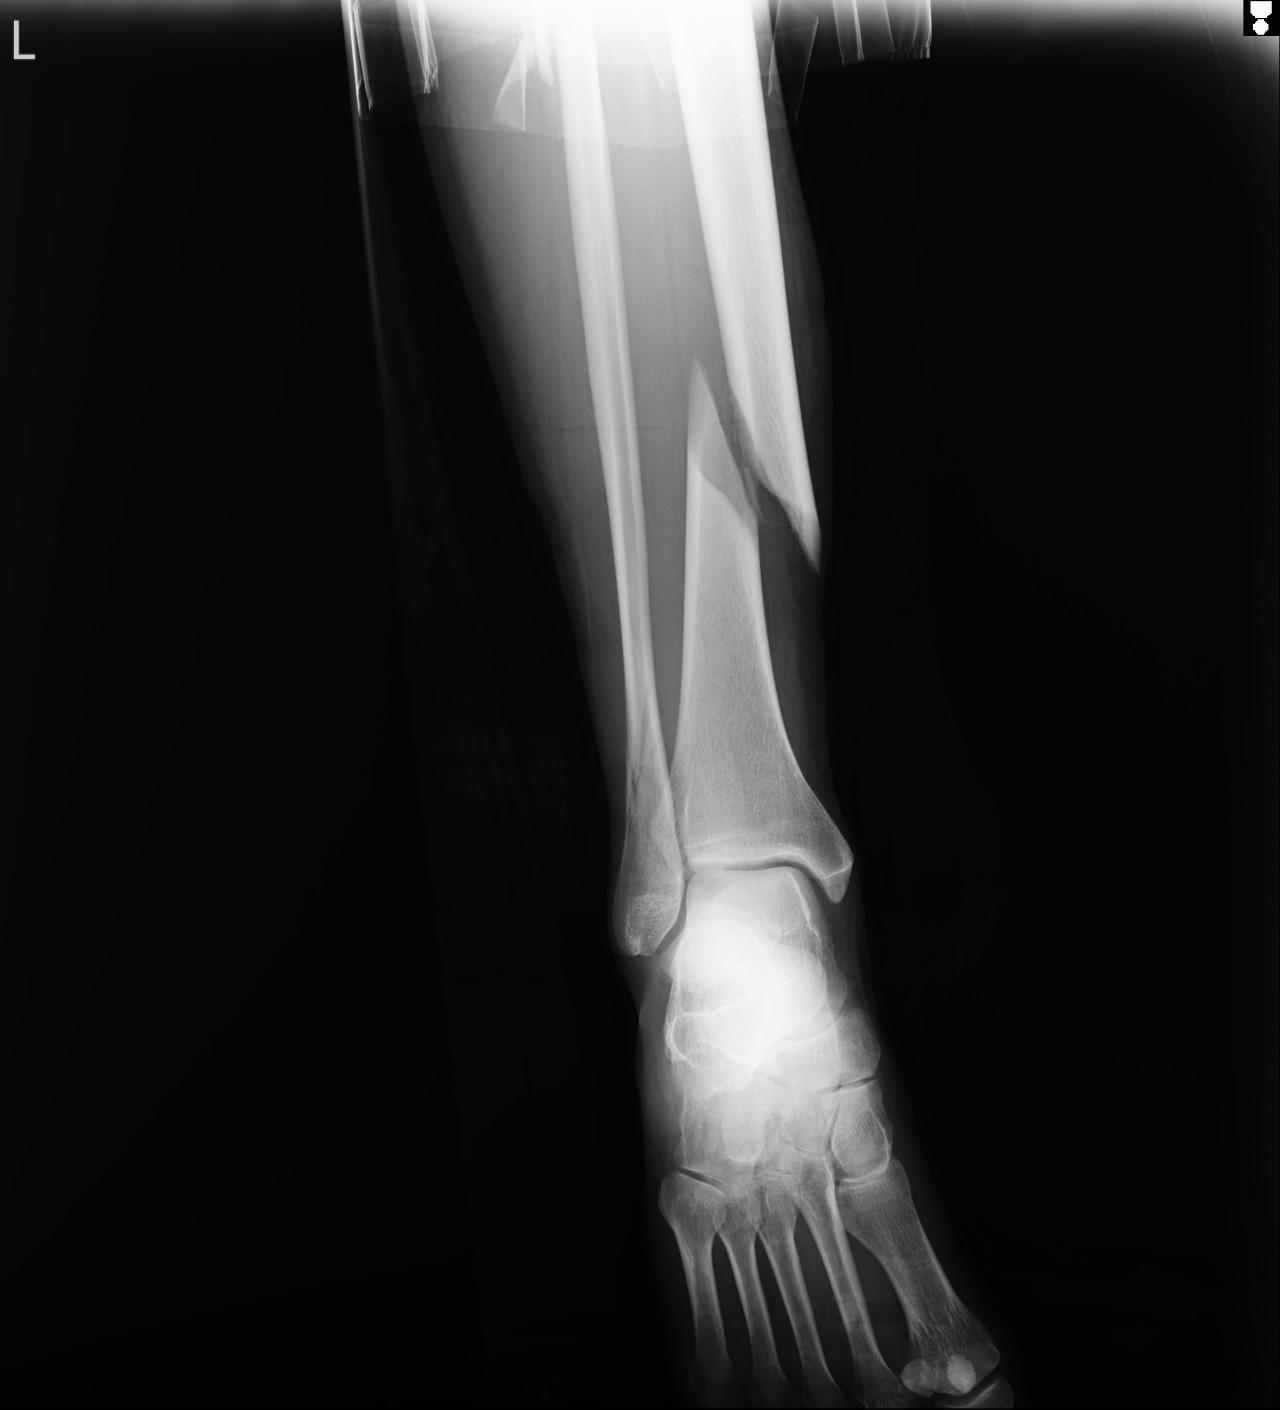 Картинки перелома костей голени